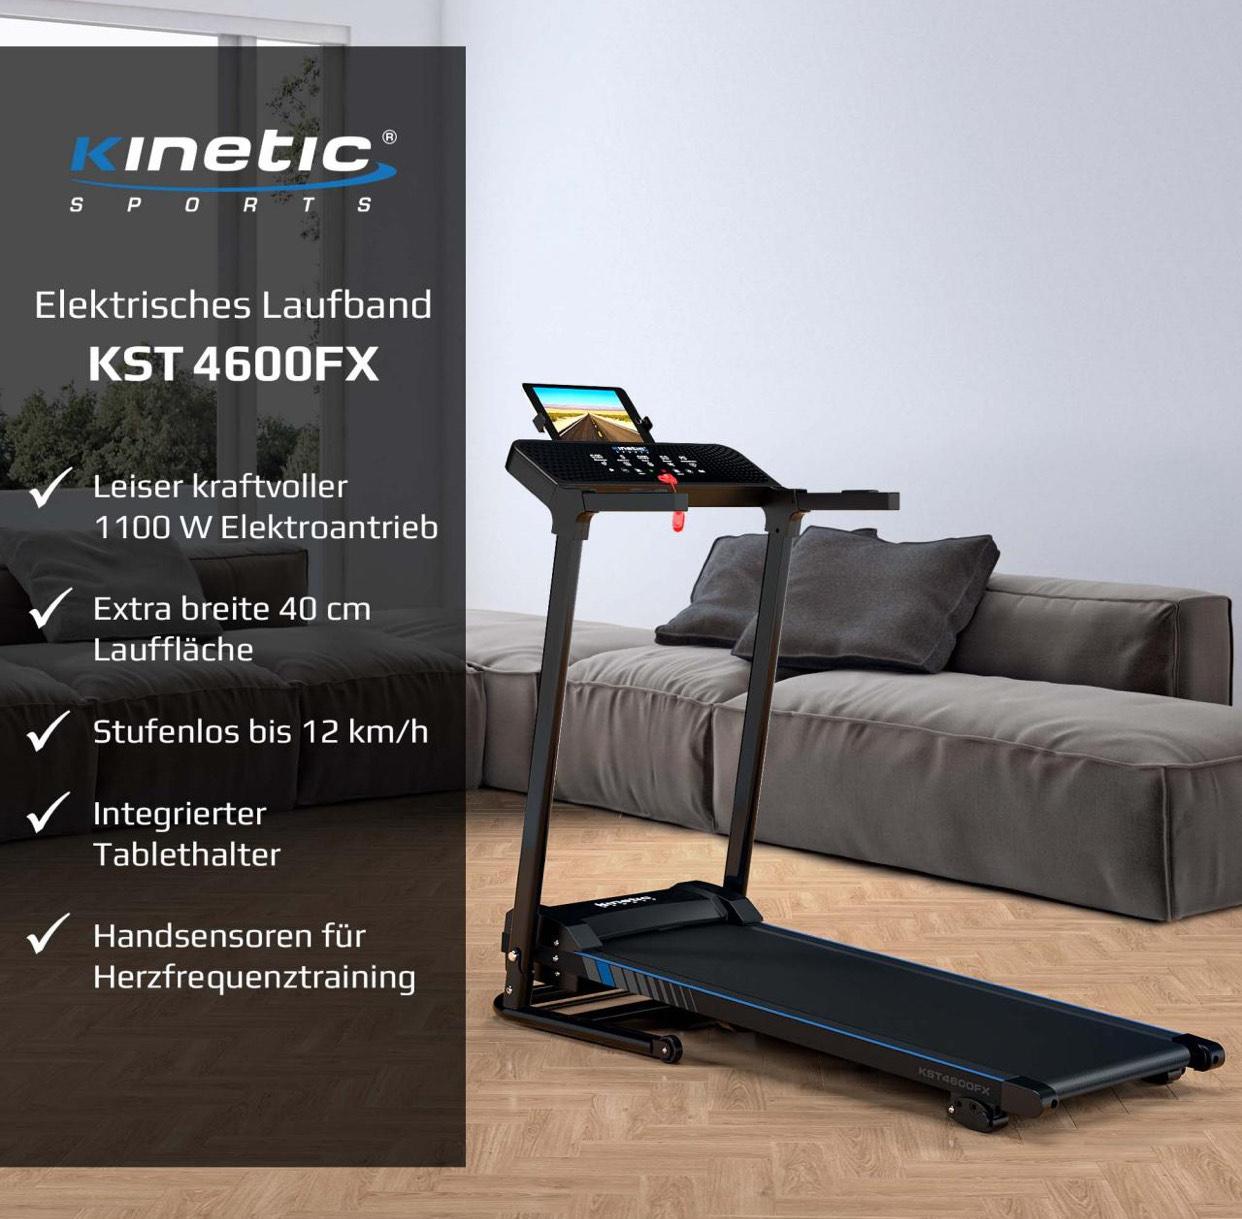 Kinetic Sports Laufband KST4600FX